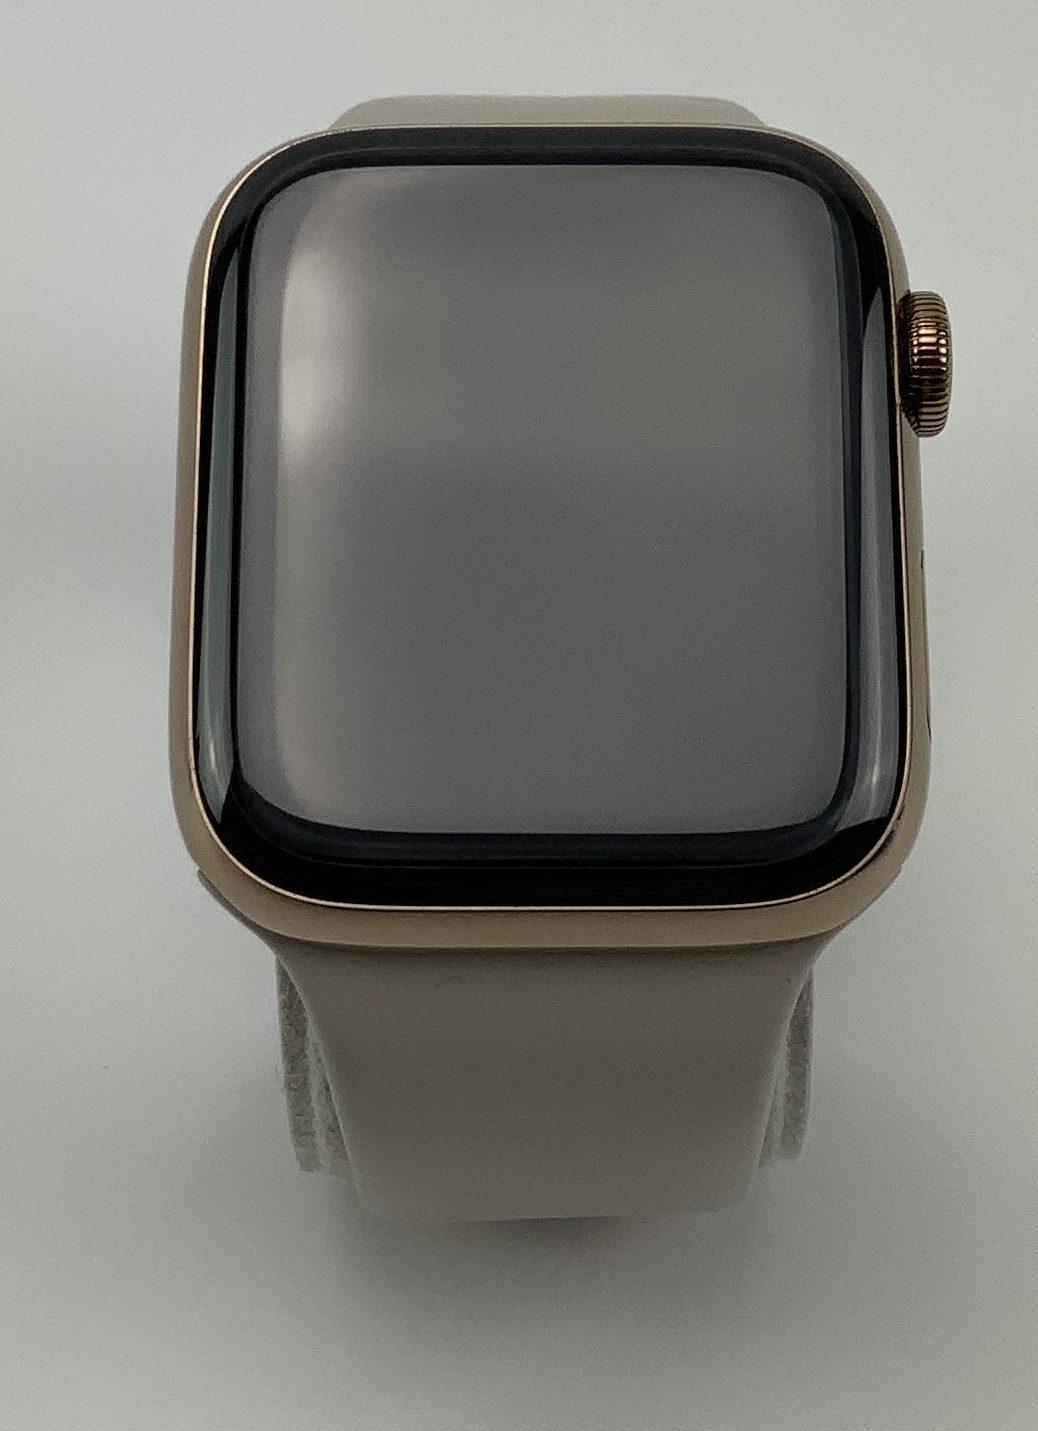 Watch Series 5 Steel Cellular (44mm), Gold, imagen 1